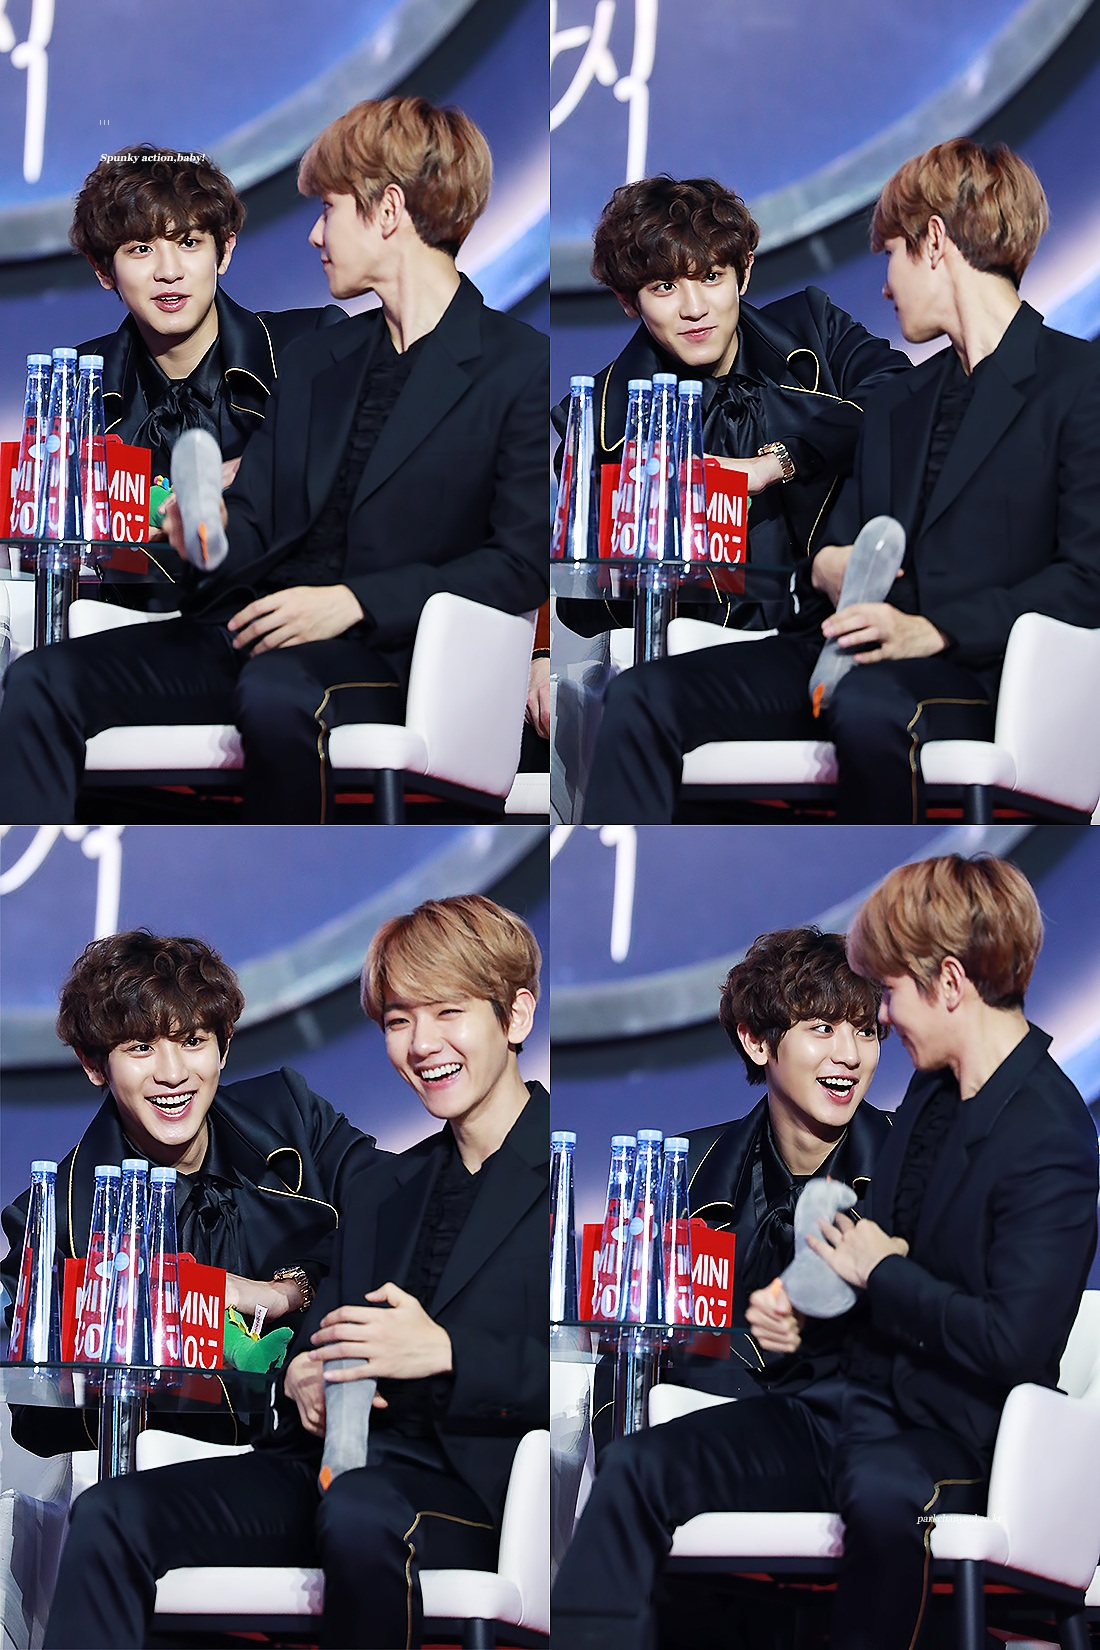 EXO's Baekhyun and Chanyeol